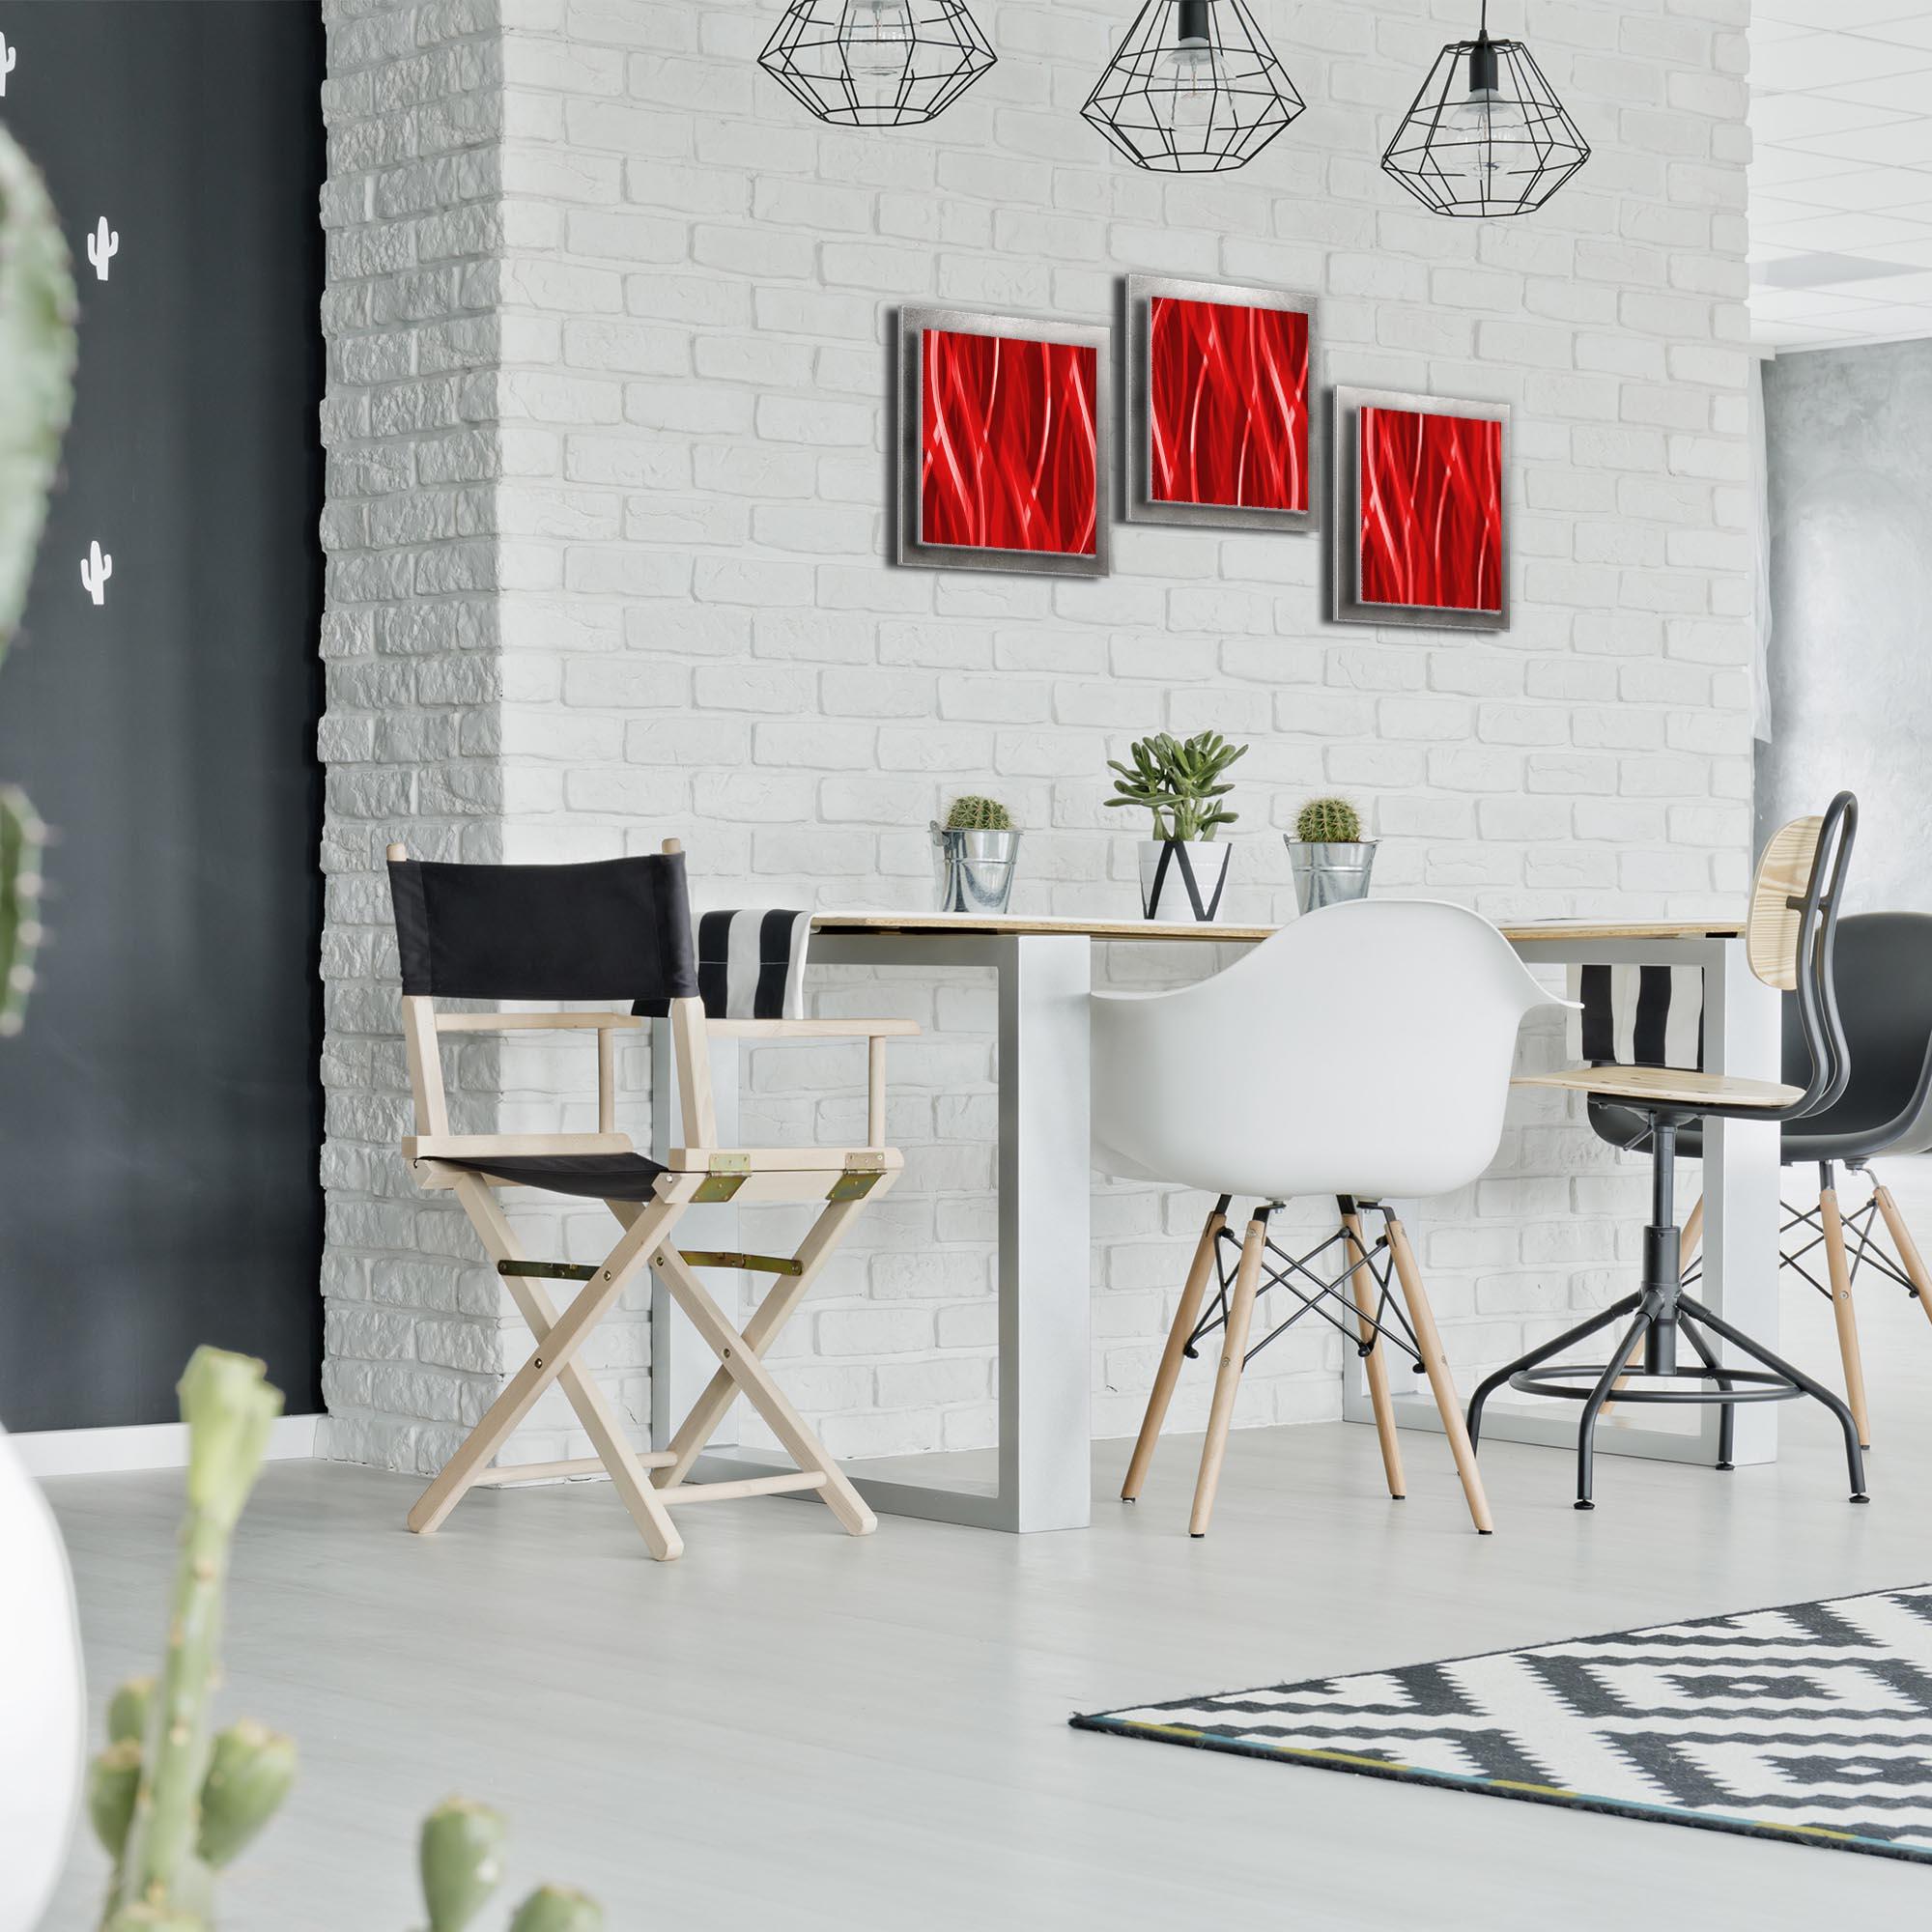 Cherry Essence - Layered Modern Metal Wall Art - Lifestyle Image